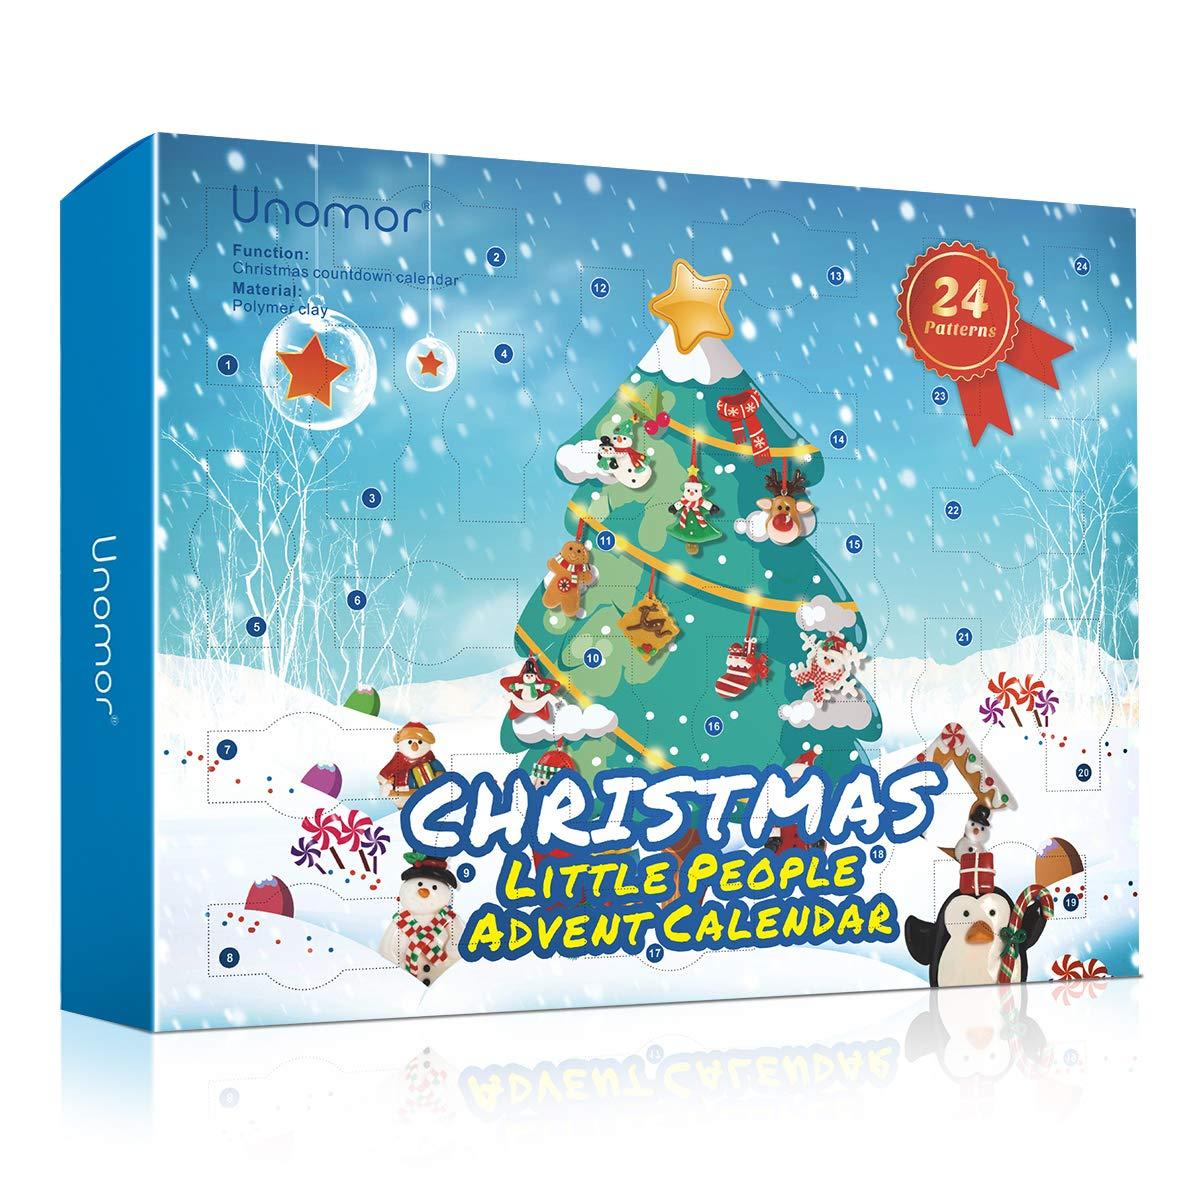 Amazon.com: Unomor Christmas Countdown Advent Calendar – 24 Pieces Christmas  Ornaments Decorations: Home & Kitchen